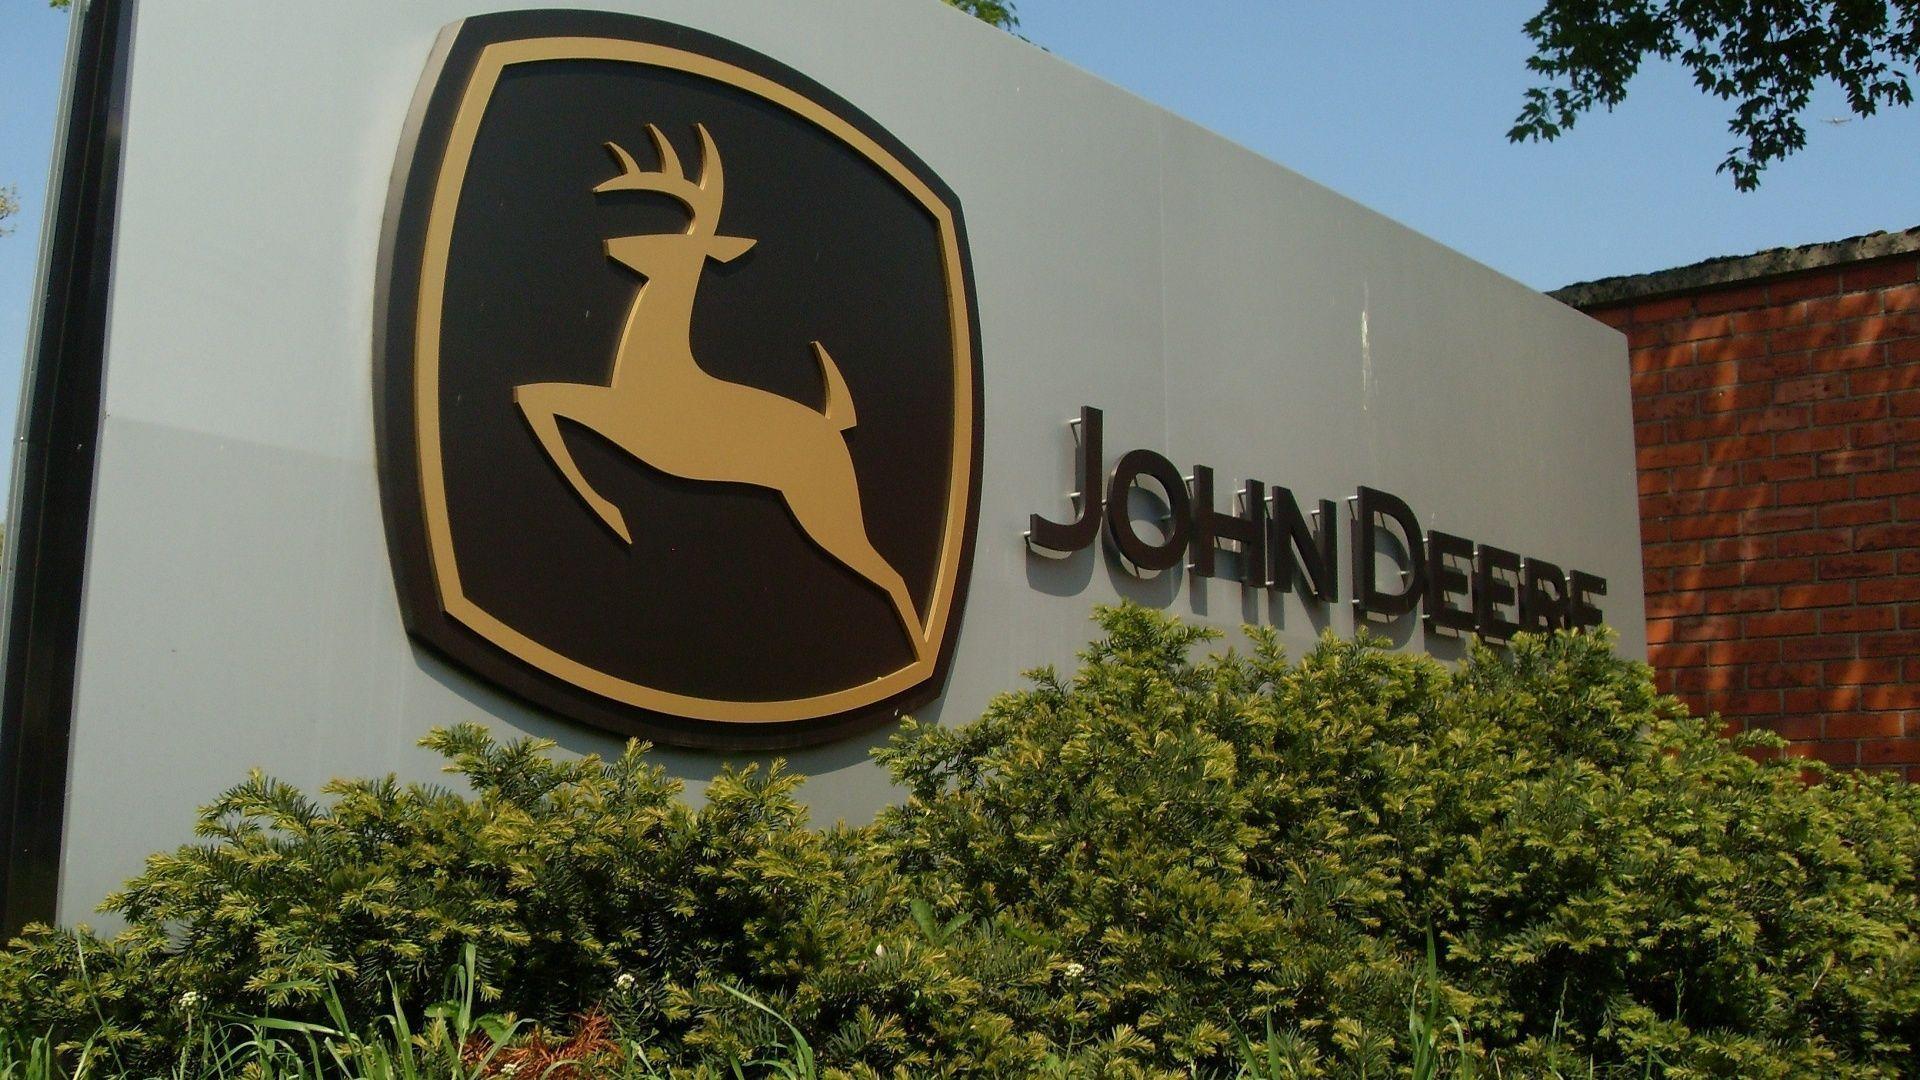 John Deere Logo Wallpapers 2017 1920x1080